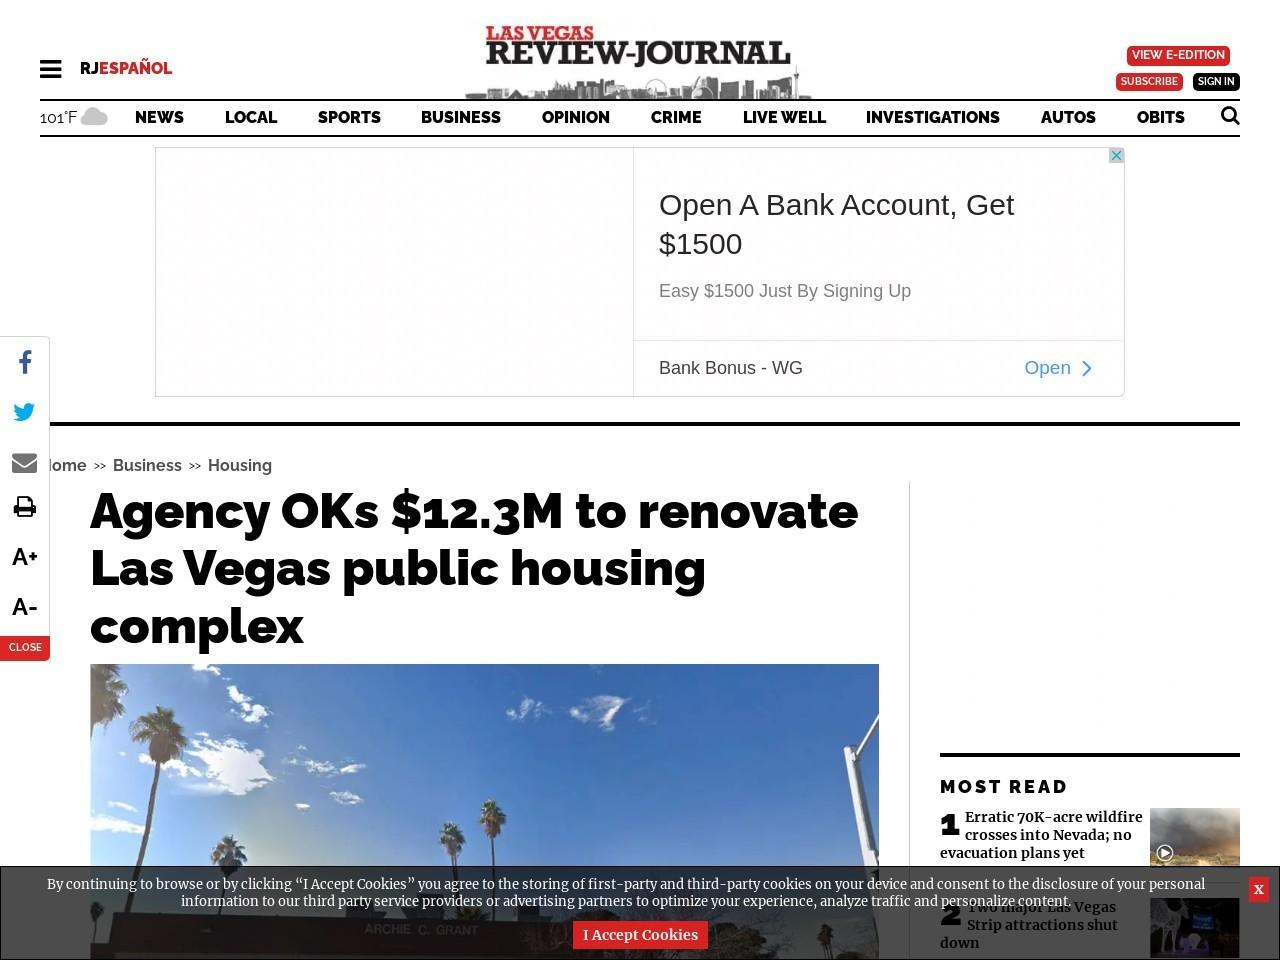 Agency OKs $12.3M to renovate Las Vegas public housing complex